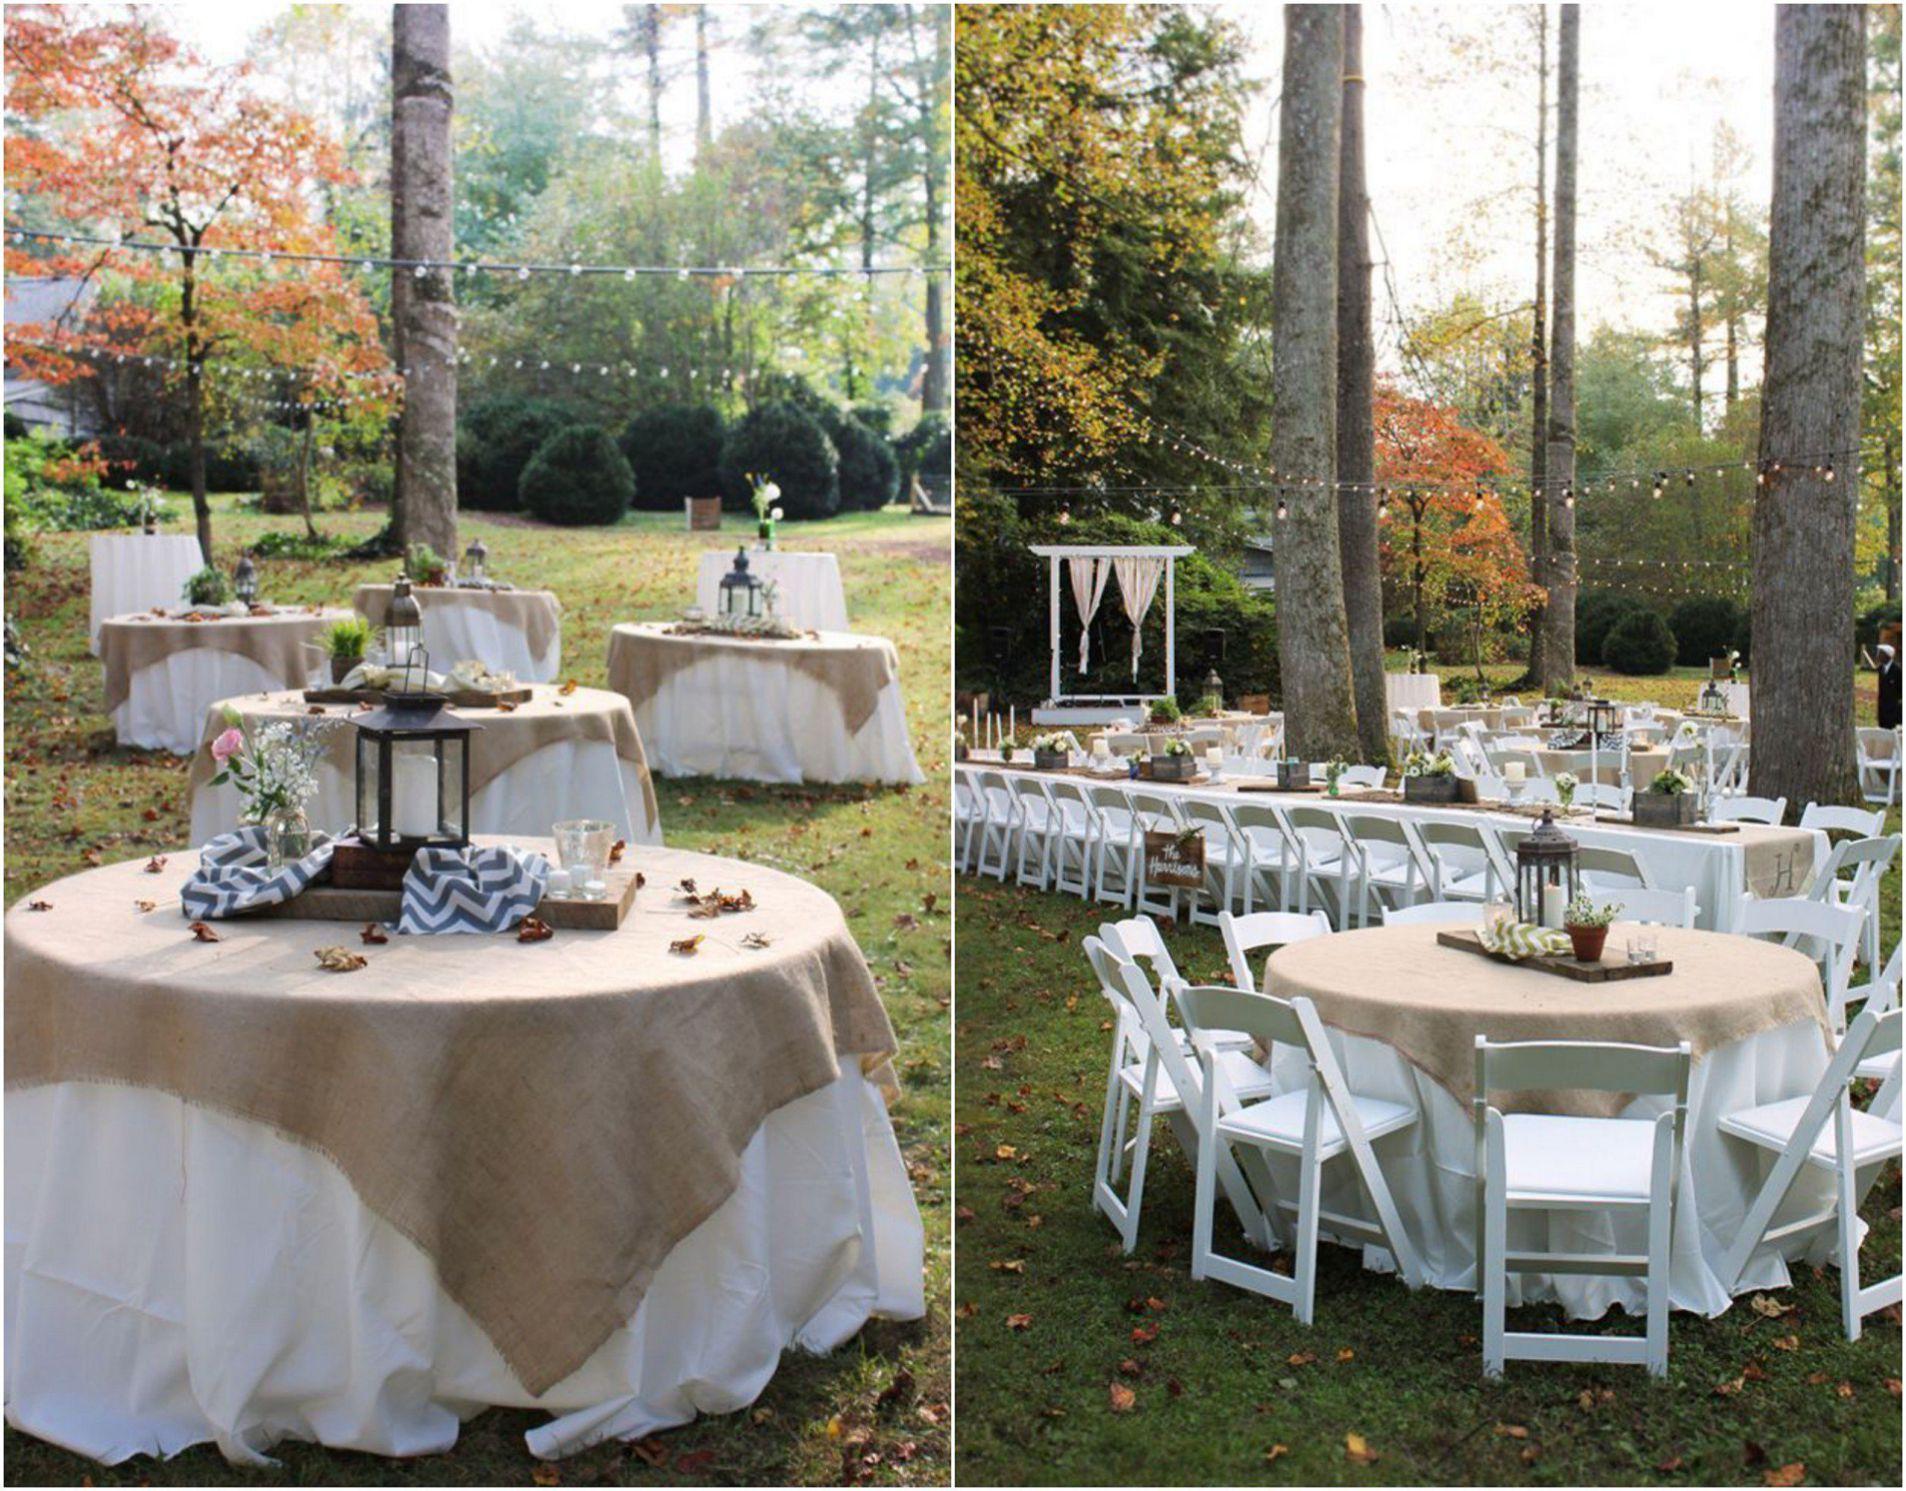 55+ Best Backyard Wedding Decoration Ideas On A Budget ...